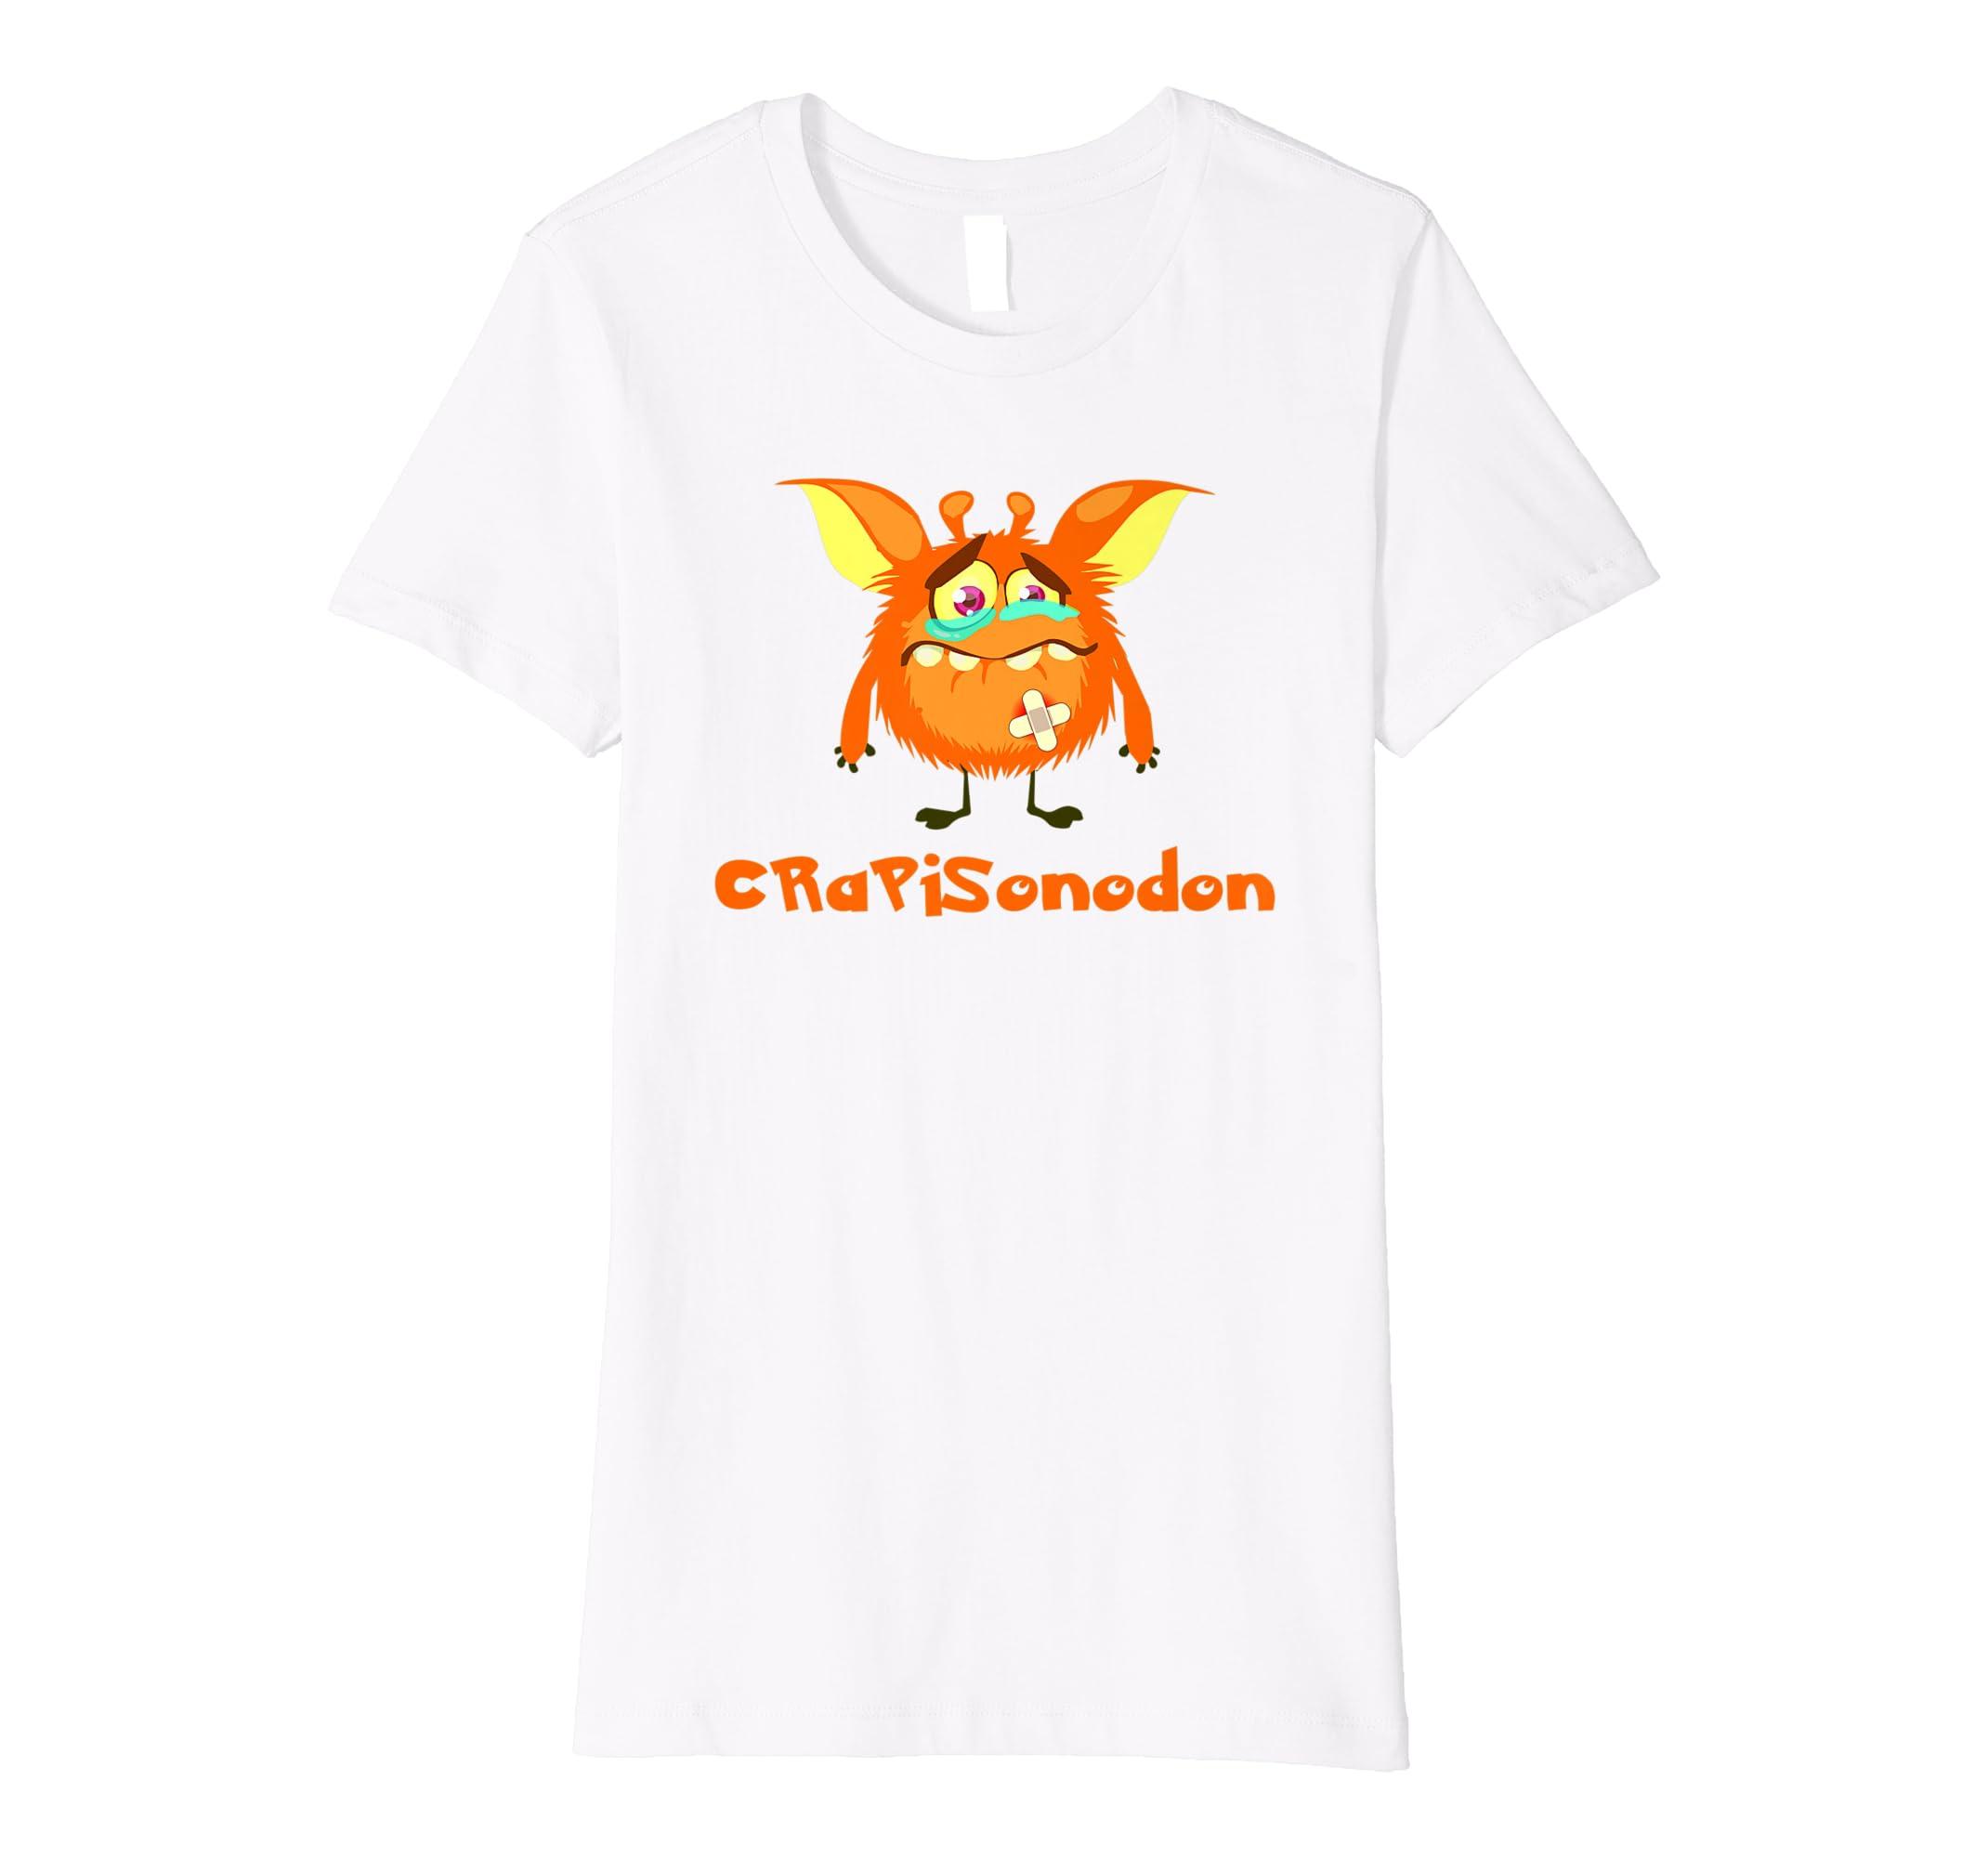 bd2b6d3ed CRPS Awareness T-Shirt - Chargimal CRaPiSonodon: Amazon.co.uk: Clothing